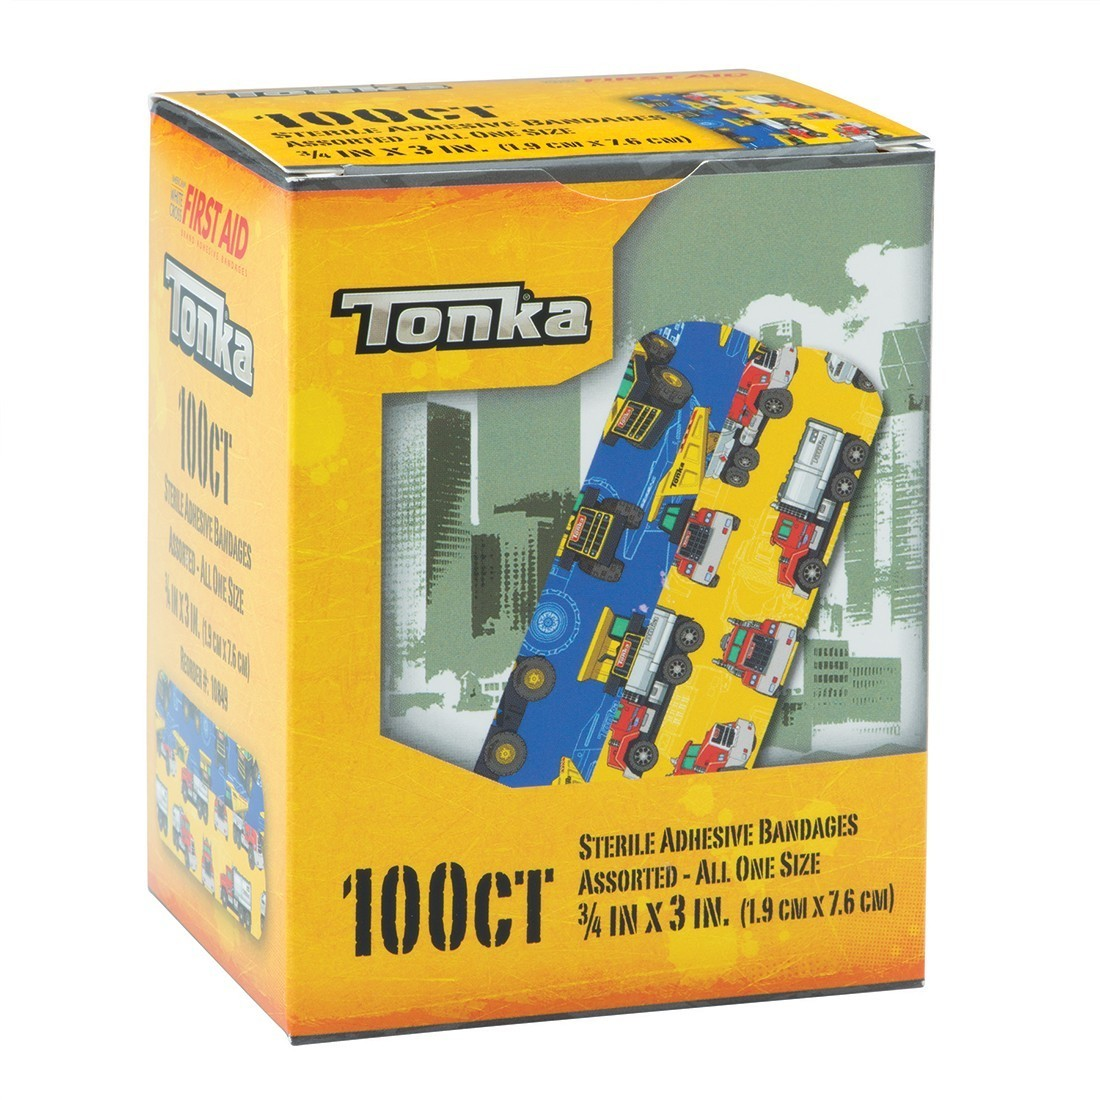 First Aid Tonka Bandages [image]